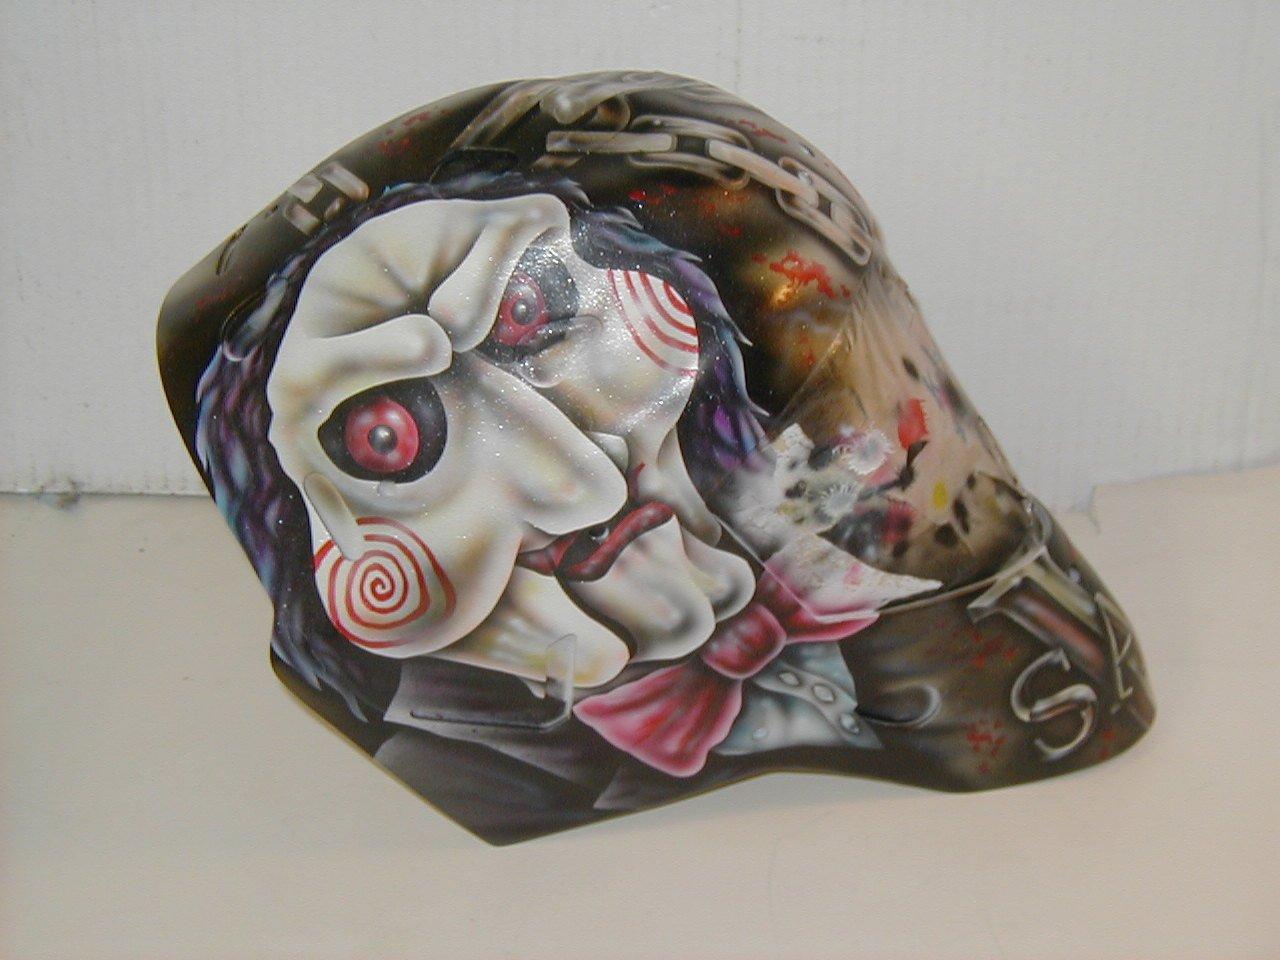 Olaf Kolzig of the Tampa Bay Lightning's Saw inspired mask